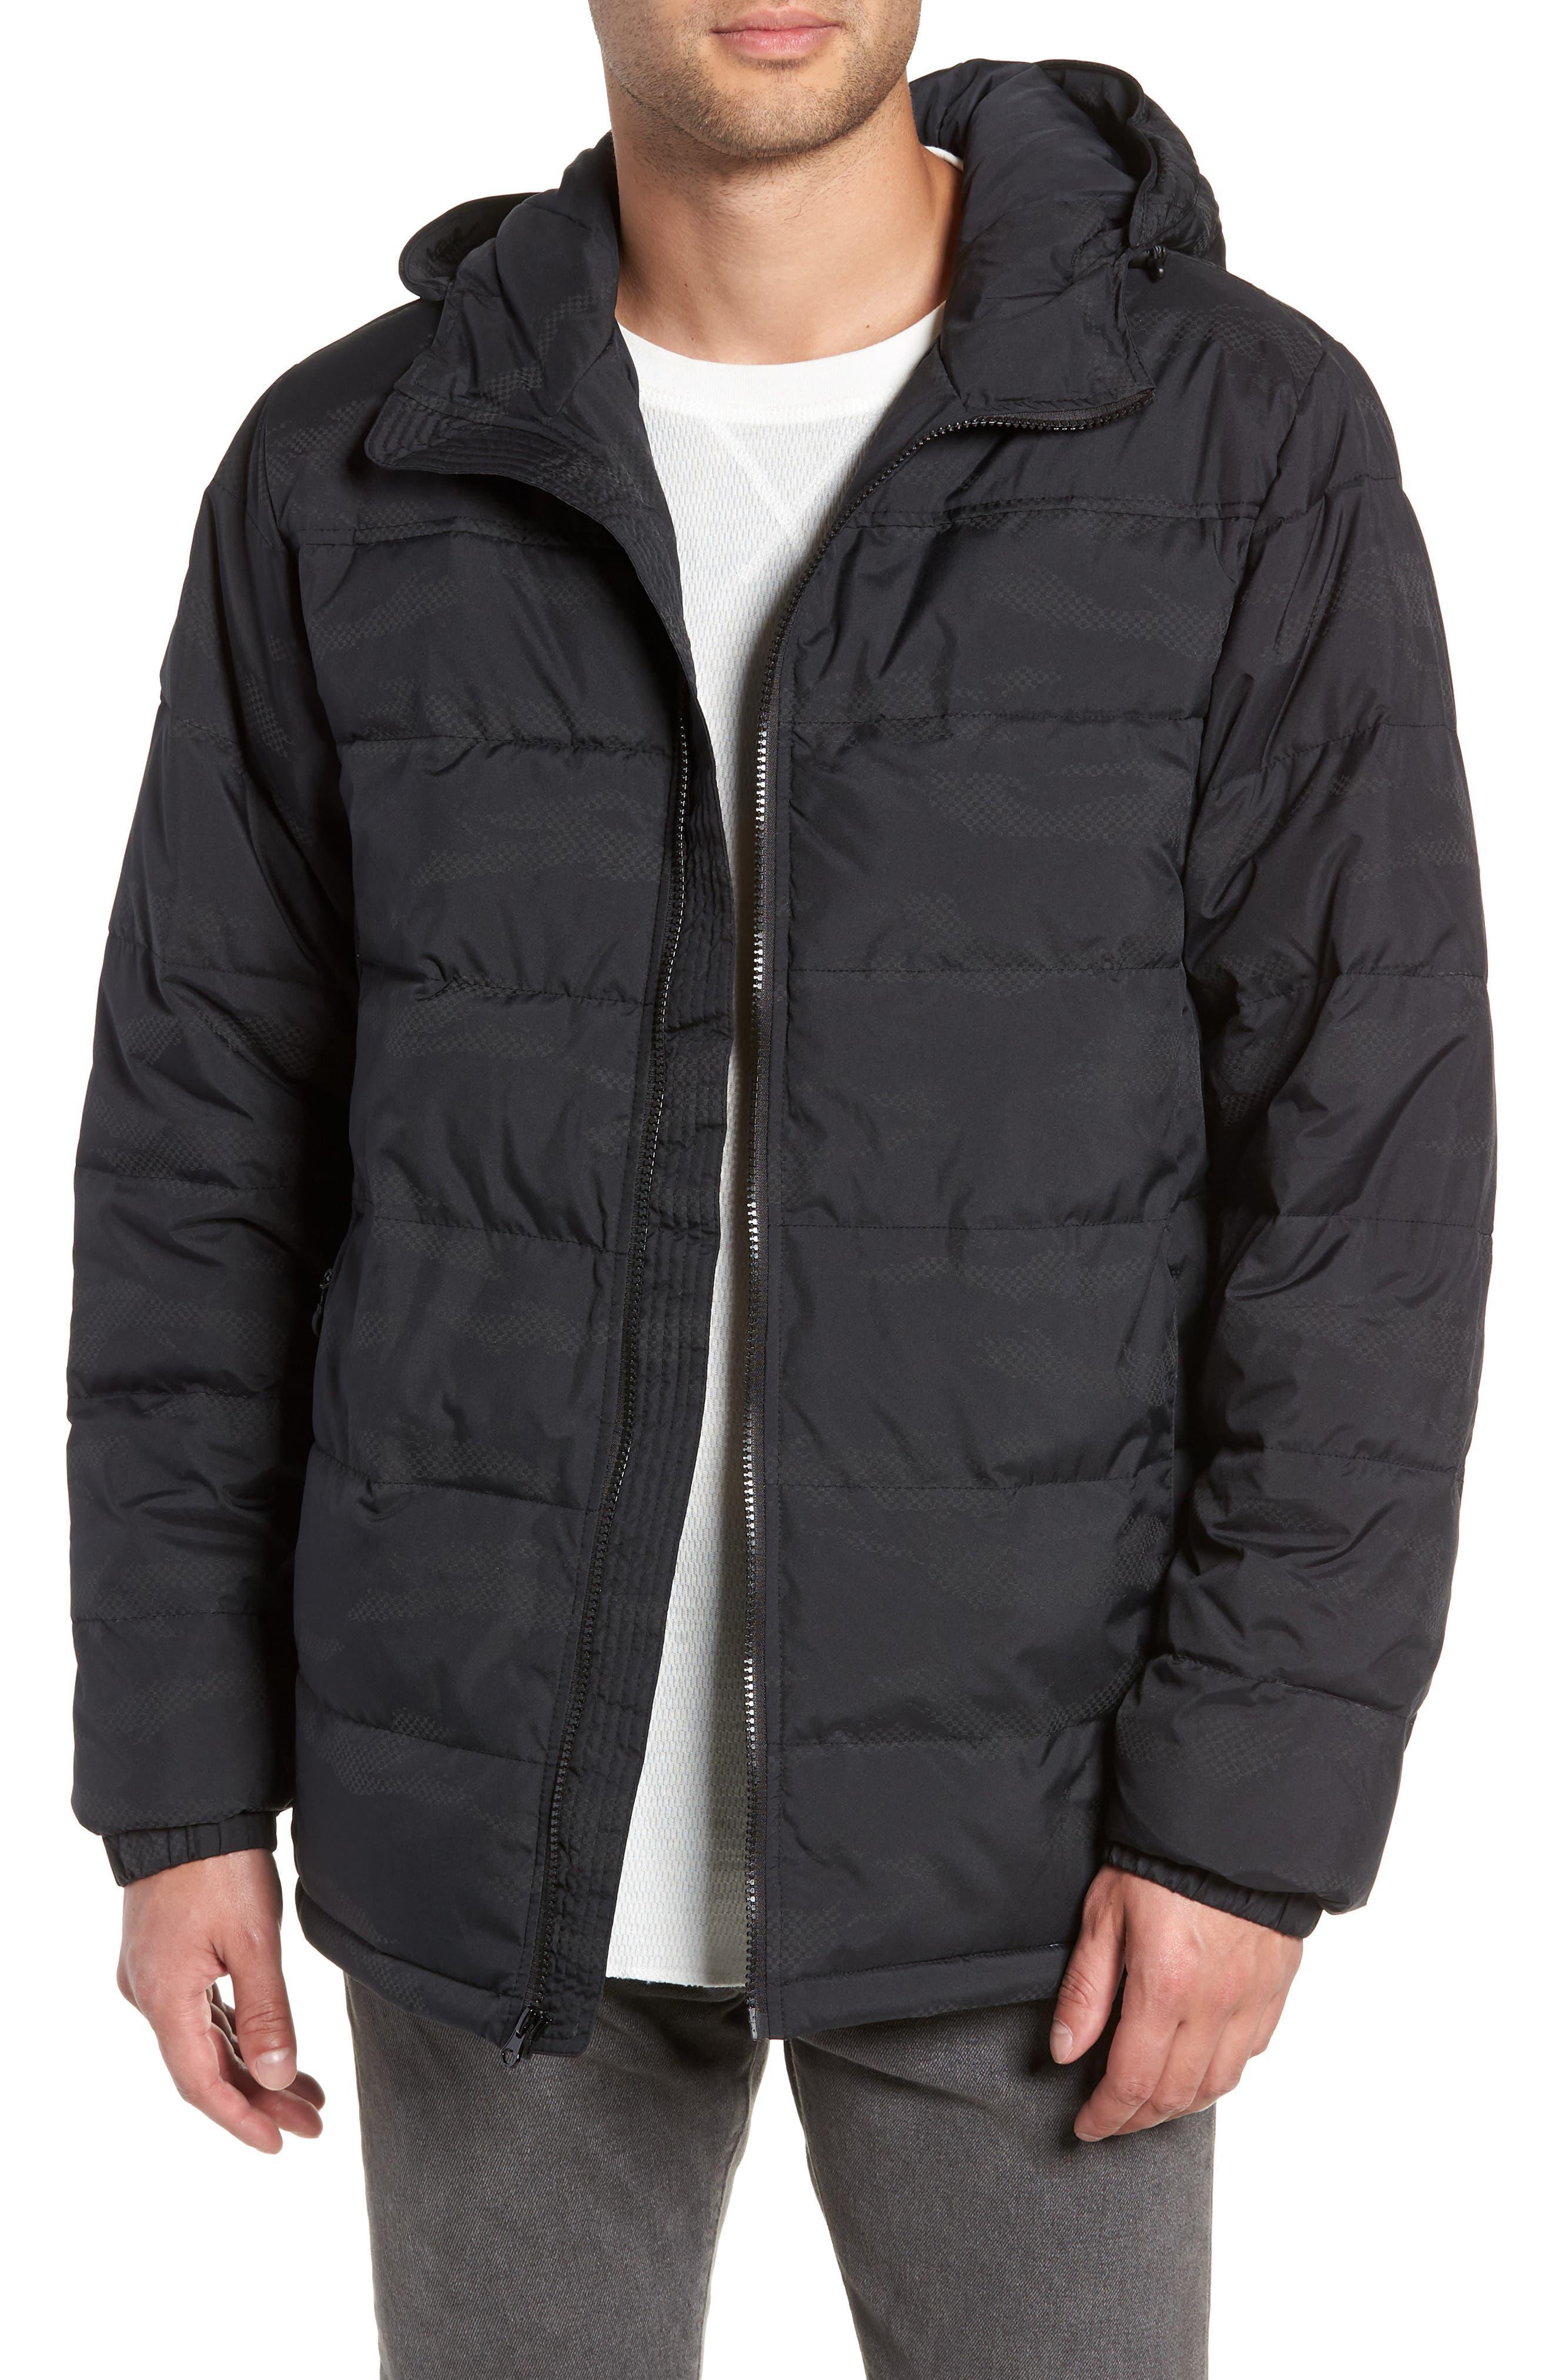 Woodcrest MTE Jacket,                             Main thumbnail 1, color,                             BLACK REFLECTIVE